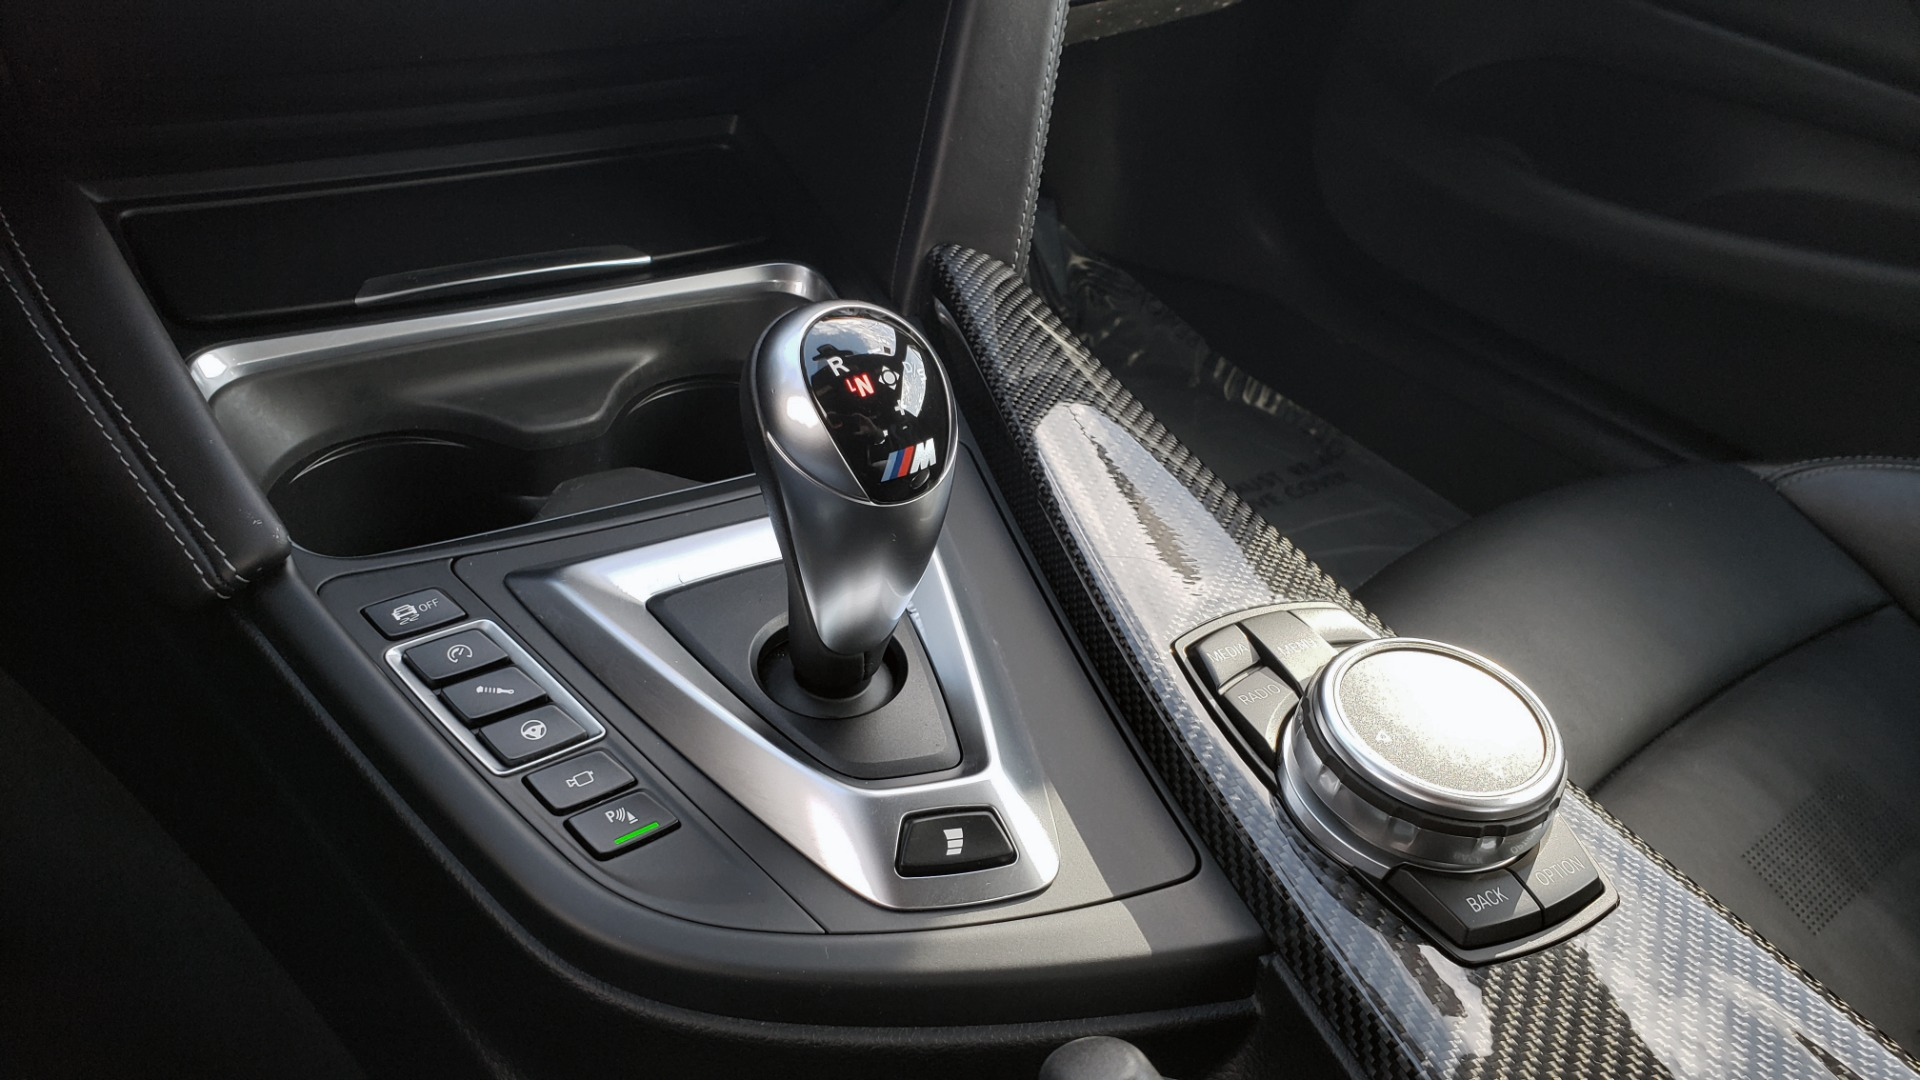 Used 2015 BMW M4 COUPE / EXEC PKG / DRVR ASST PLUS / LIGHTING / M-SUSPENSION for sale Sold at Formula Imports in Charlotte NC 28227 57